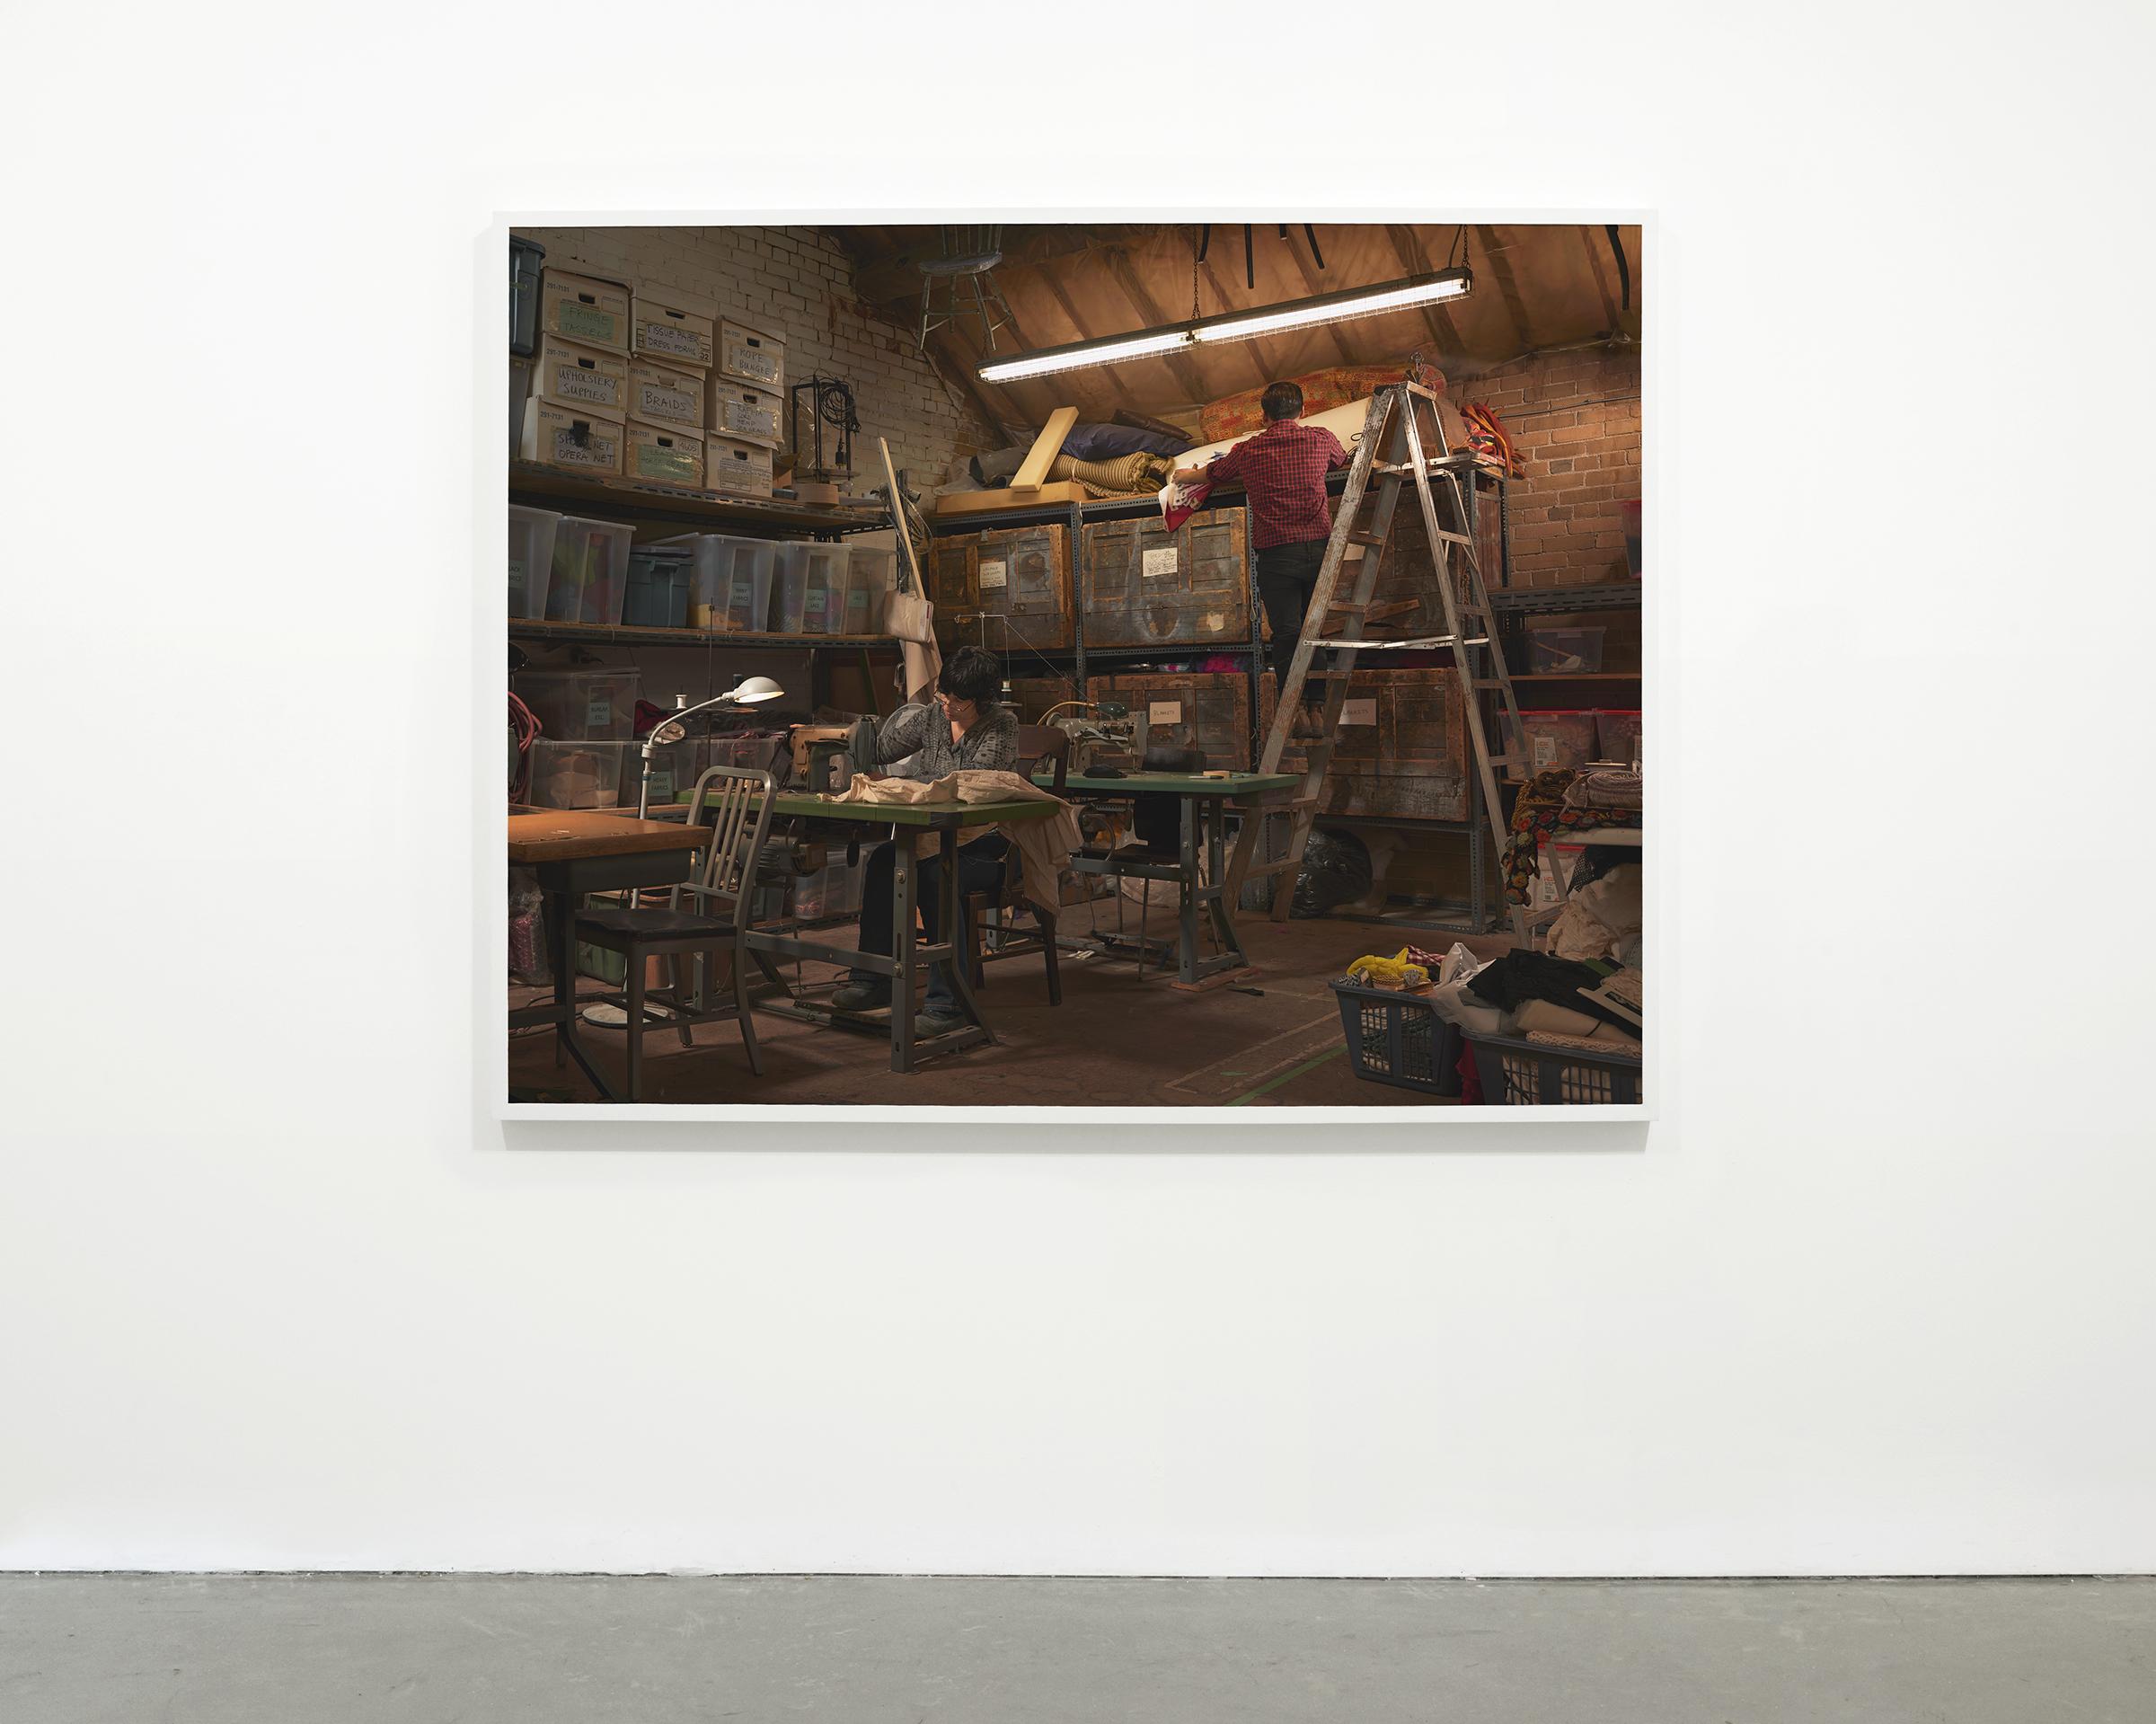 """Props"", 2014 - 2015  54"" x 69.25 in (137.15 x 175.90 cm)"